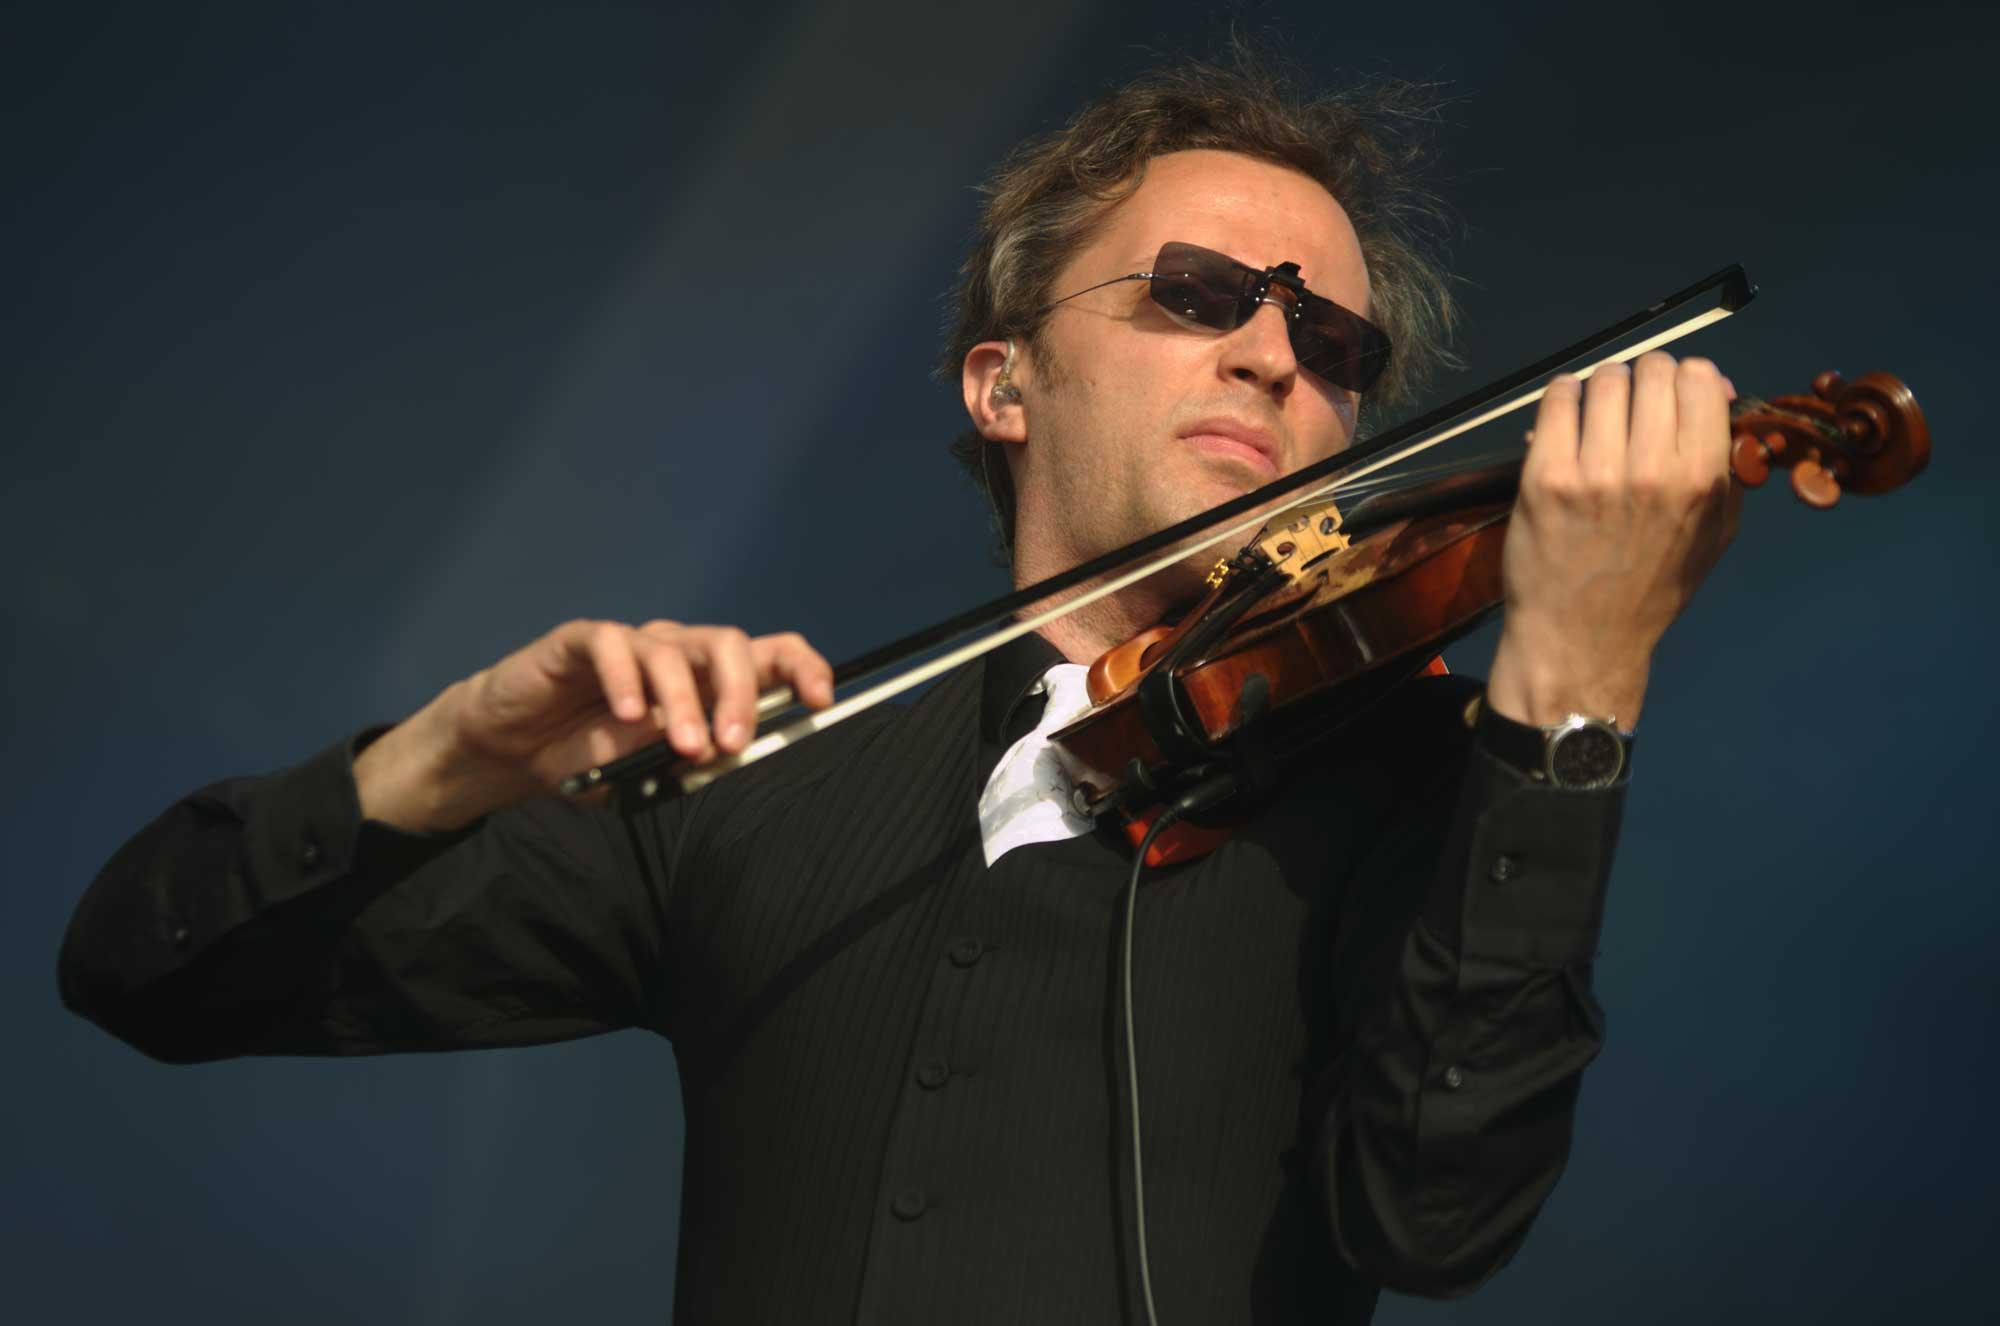 Vassil Lambrinov, violinista del grup Blaumut, actuant al Canet Rock 2016